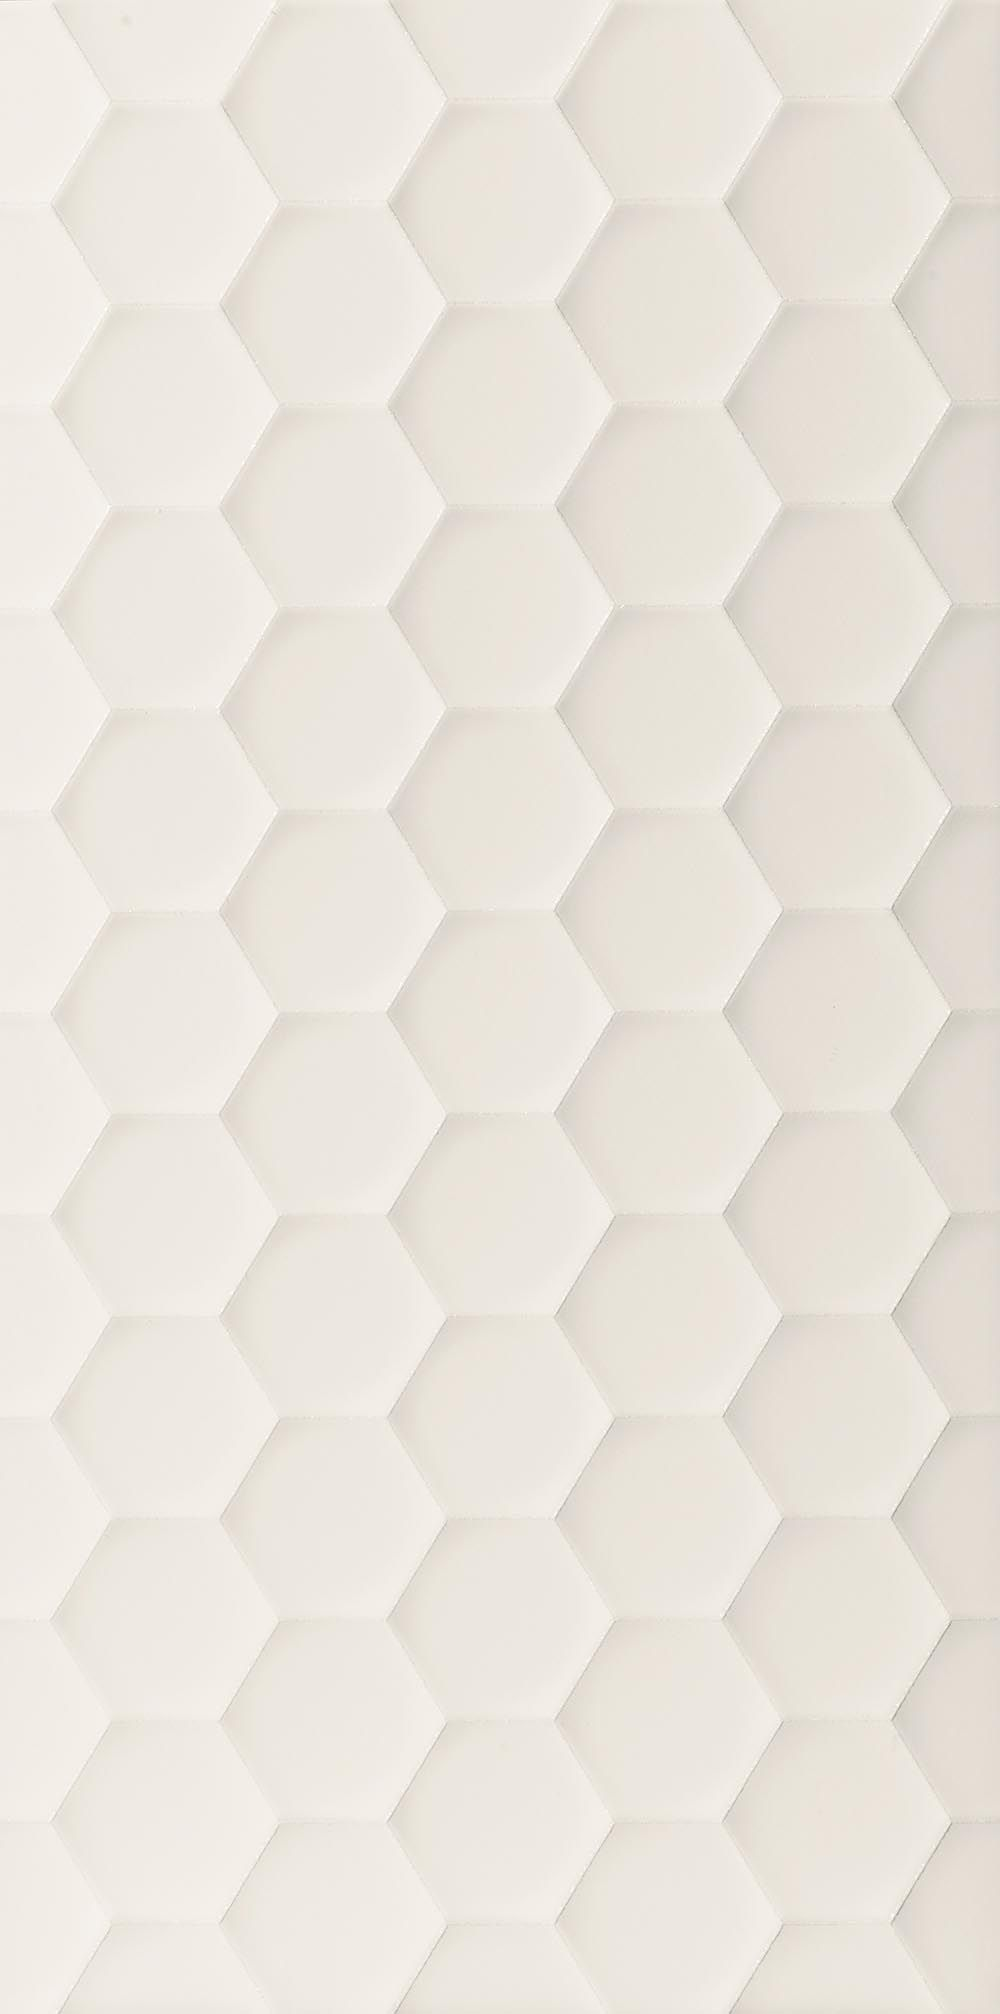 Multidimensional 3d Textured Ceramic Wall Tiles Wall